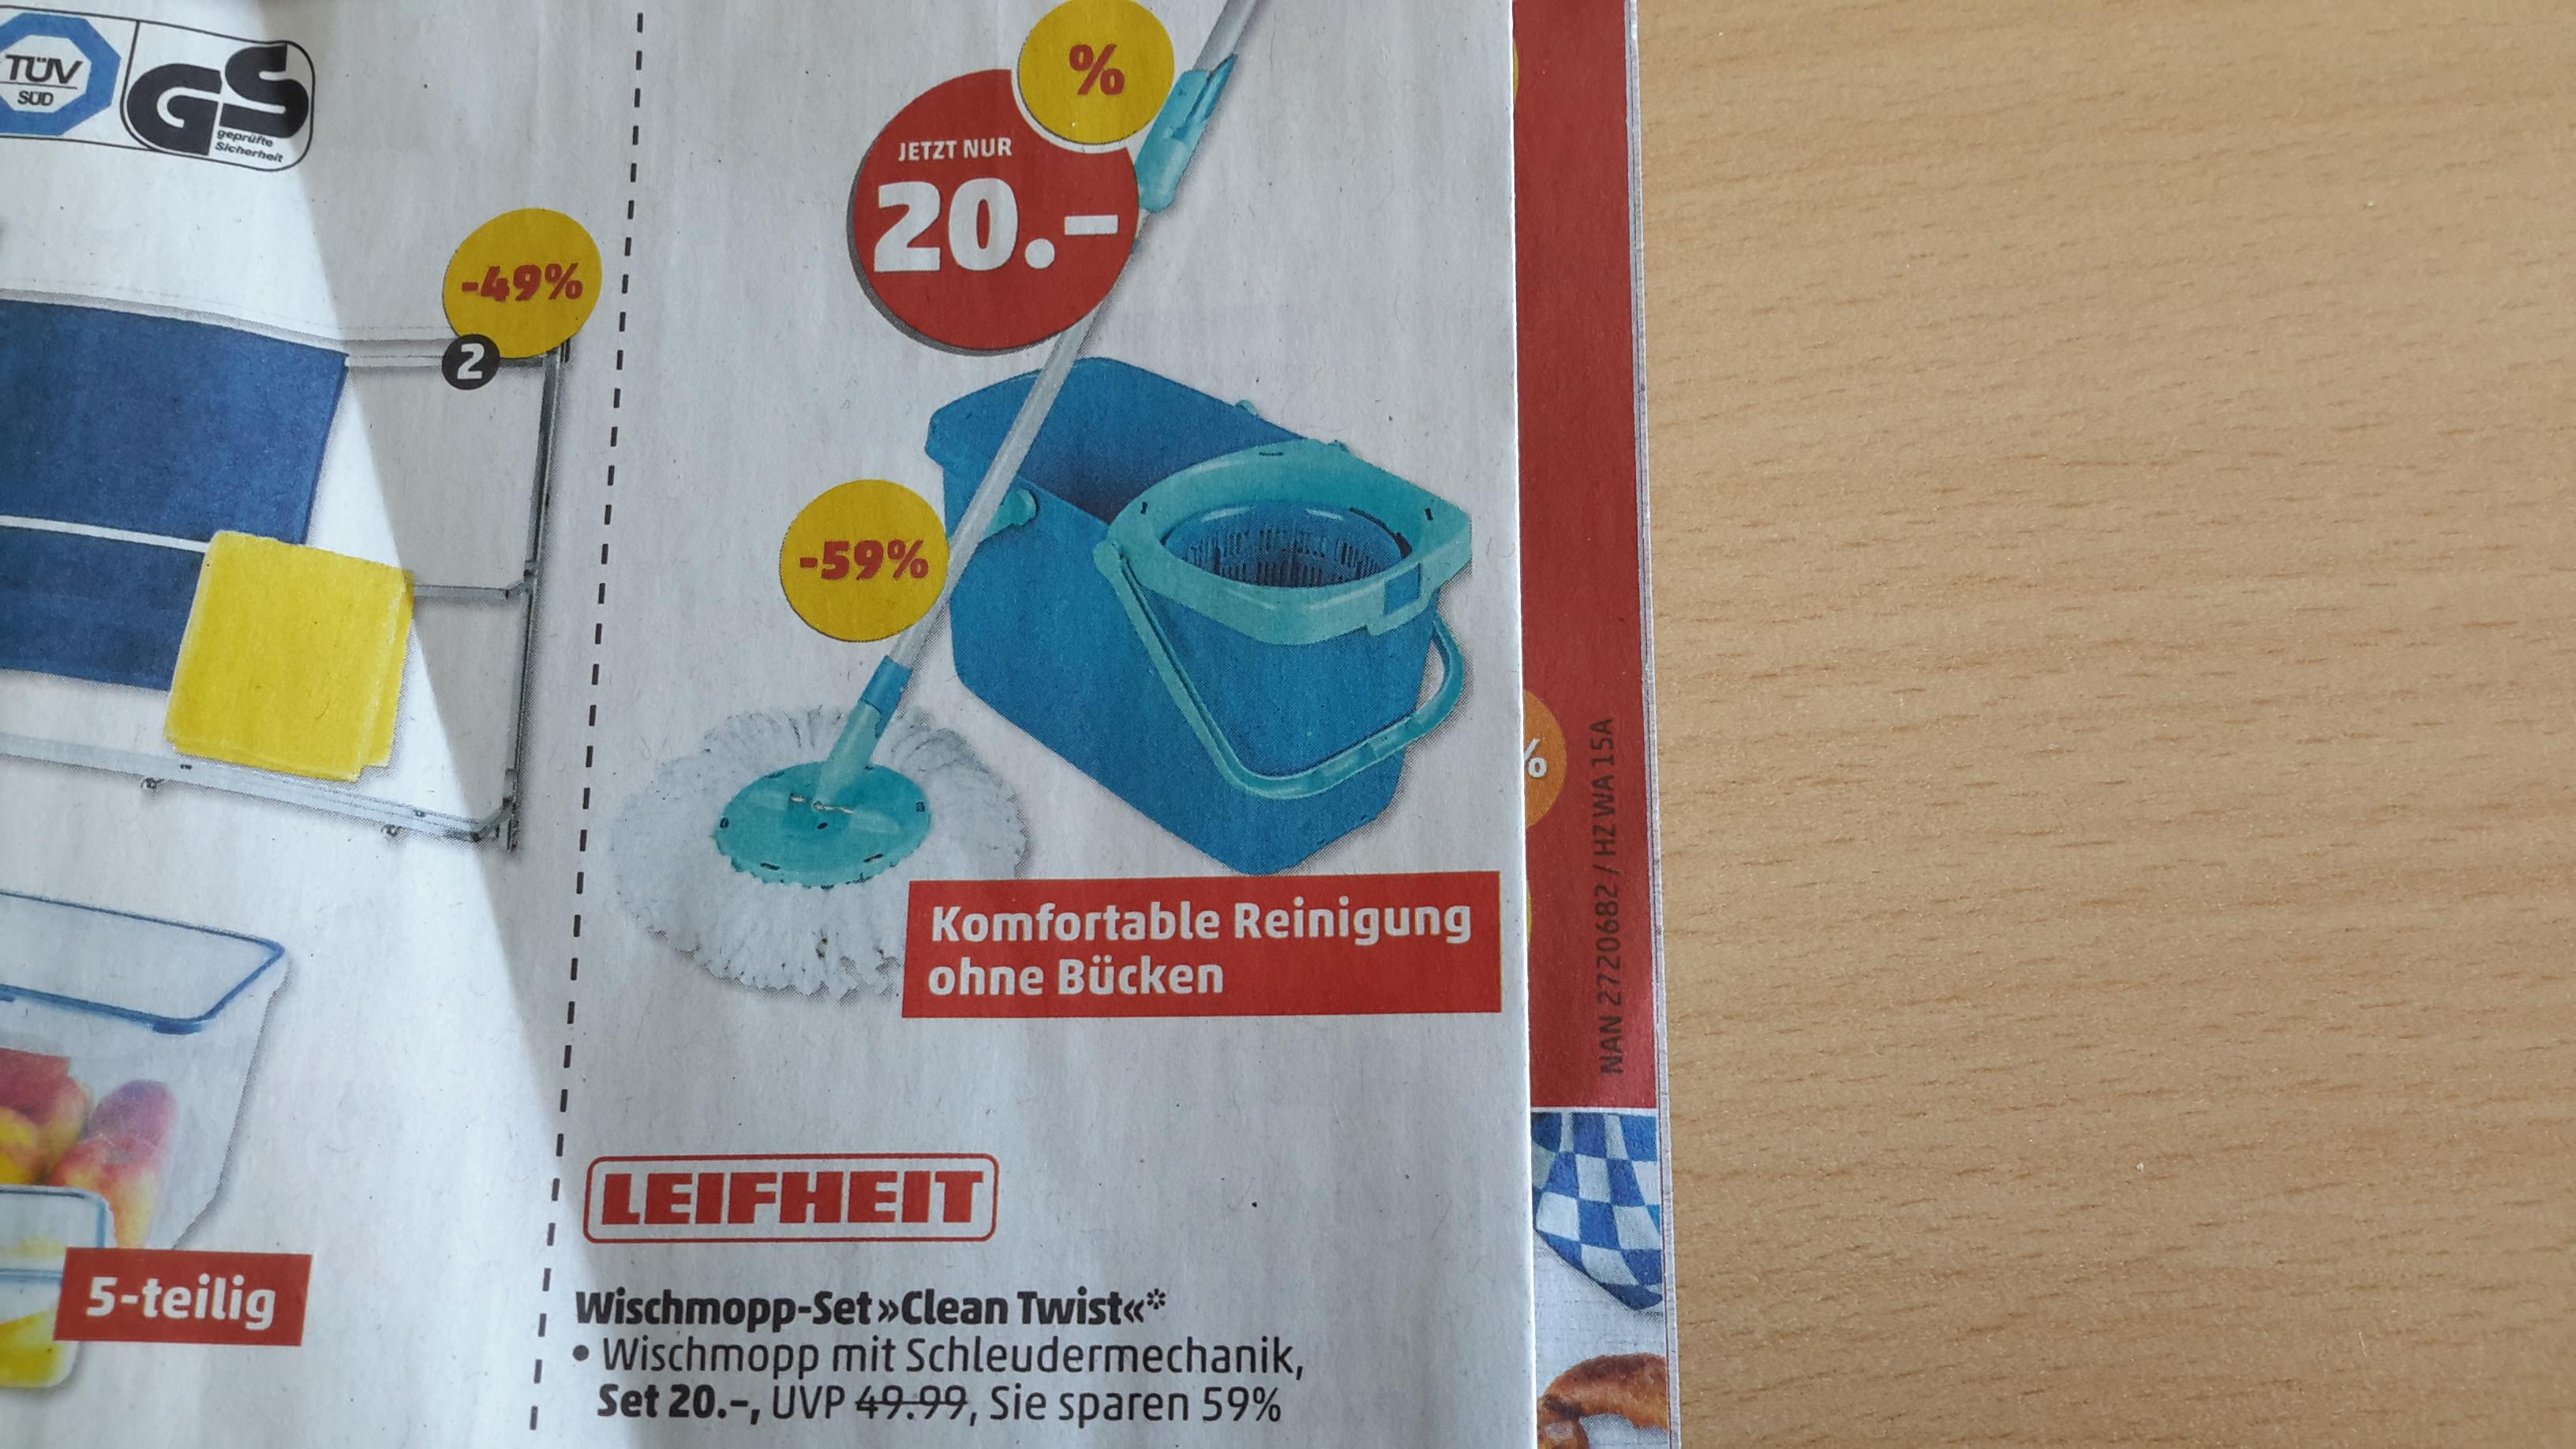 "Leifheit Wischmop-Set ""CleanTwist"" 52019 (offline bei Penny)"